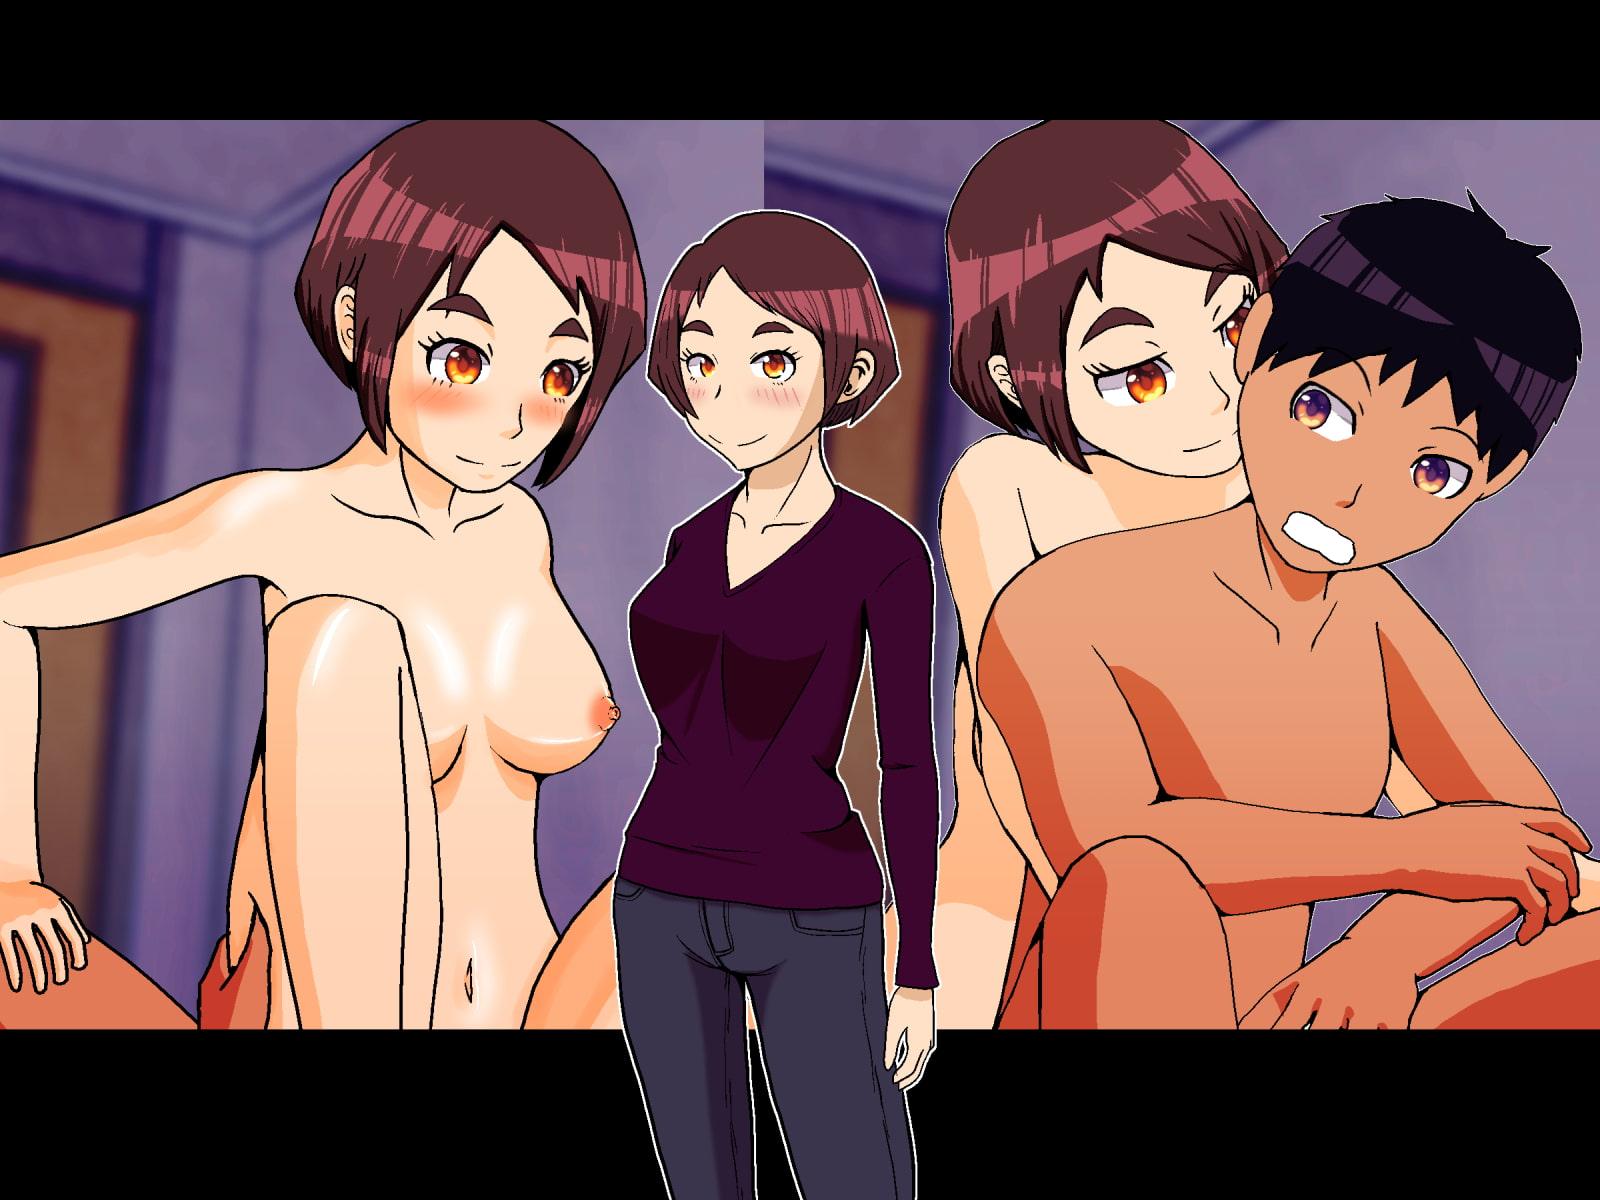 RJ318712 お風呂でオナニーしてたらお姉ちゃんが入って来て童貞を卒業する話 [20210305]